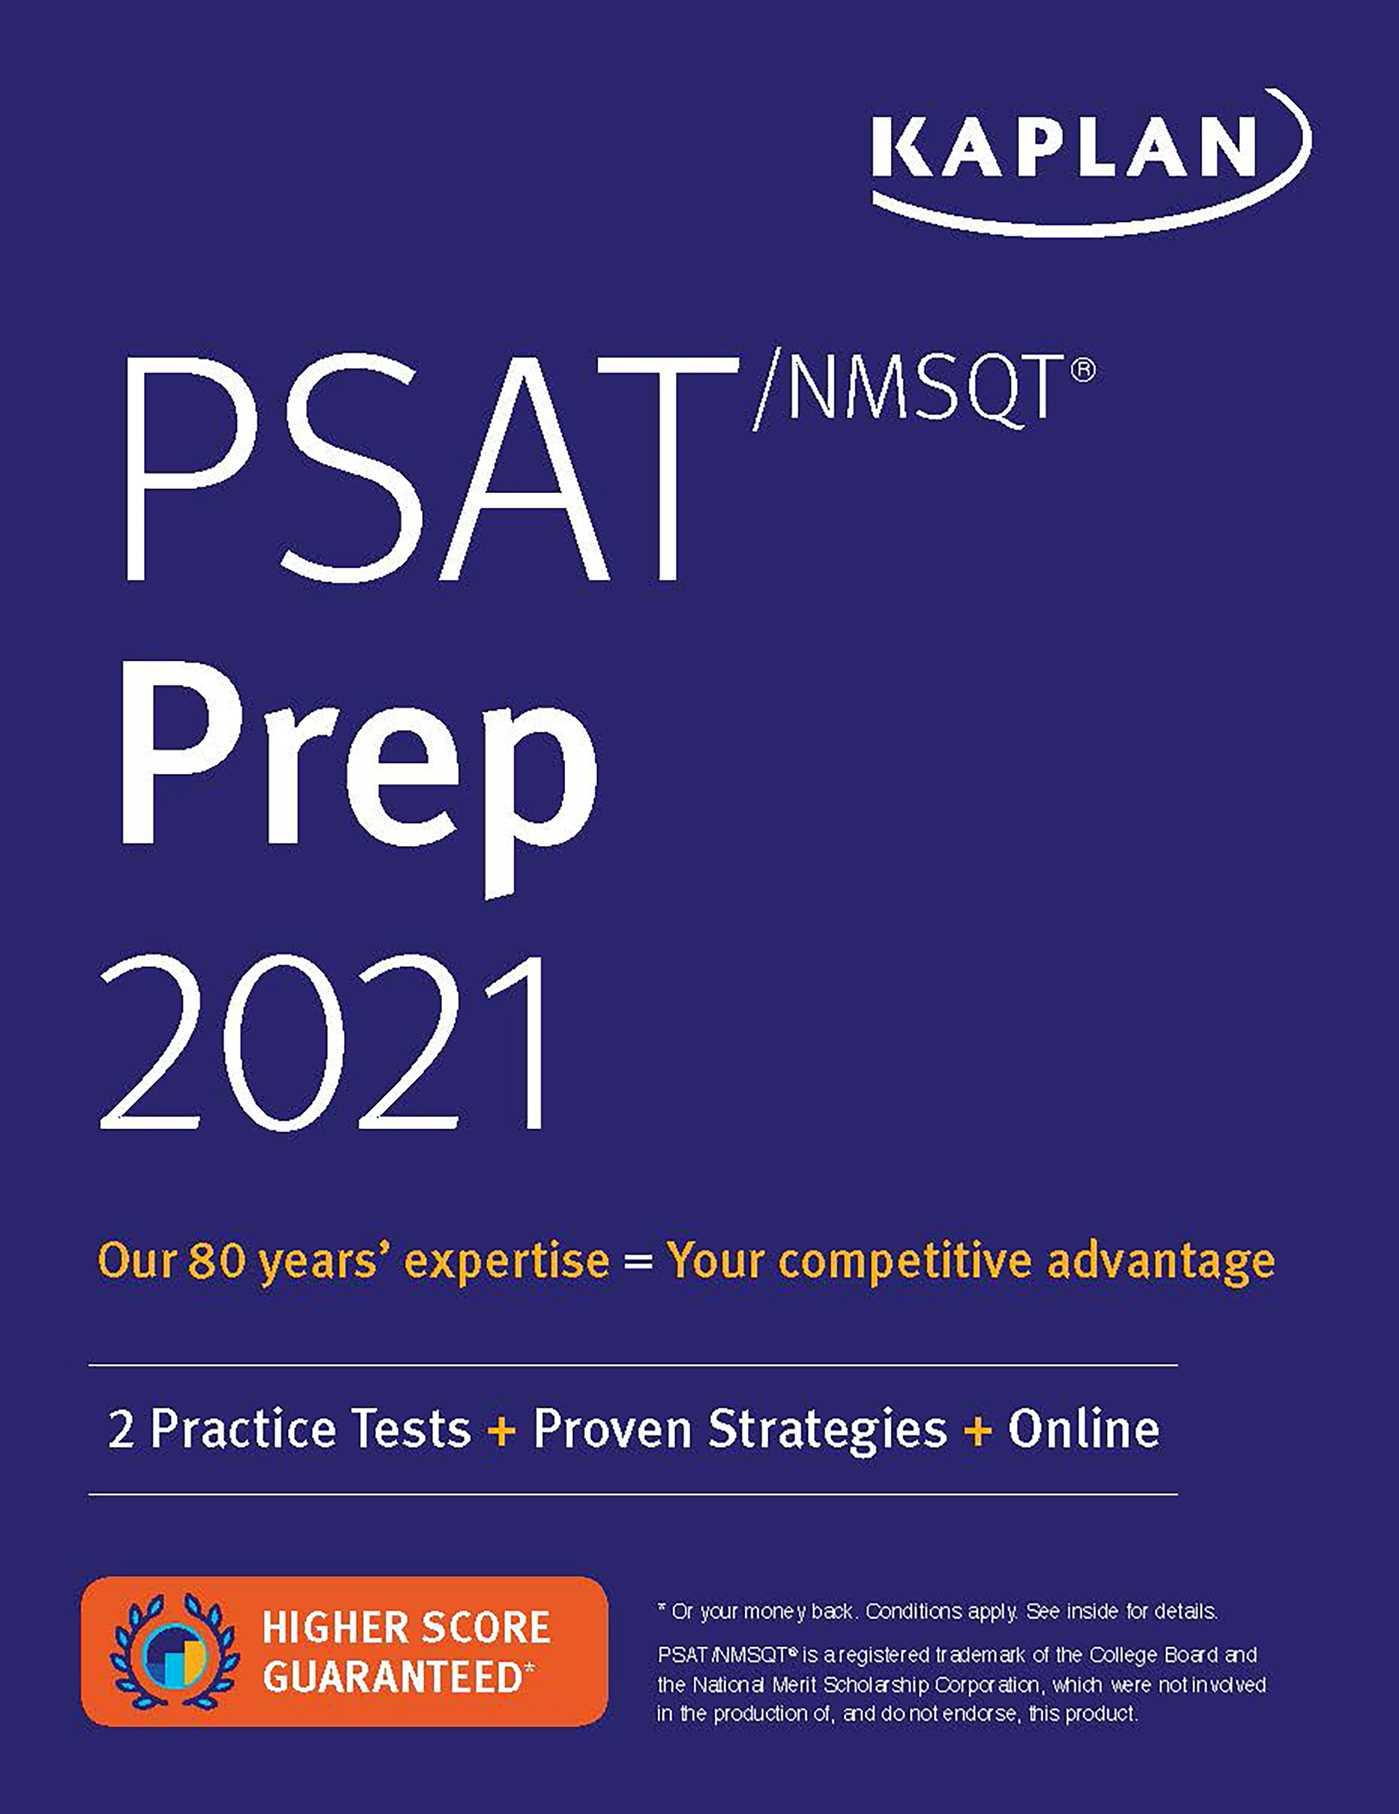 PSAT/NMSQT Prep 2021: 2 Practice Tests + Proven Strategies + Online